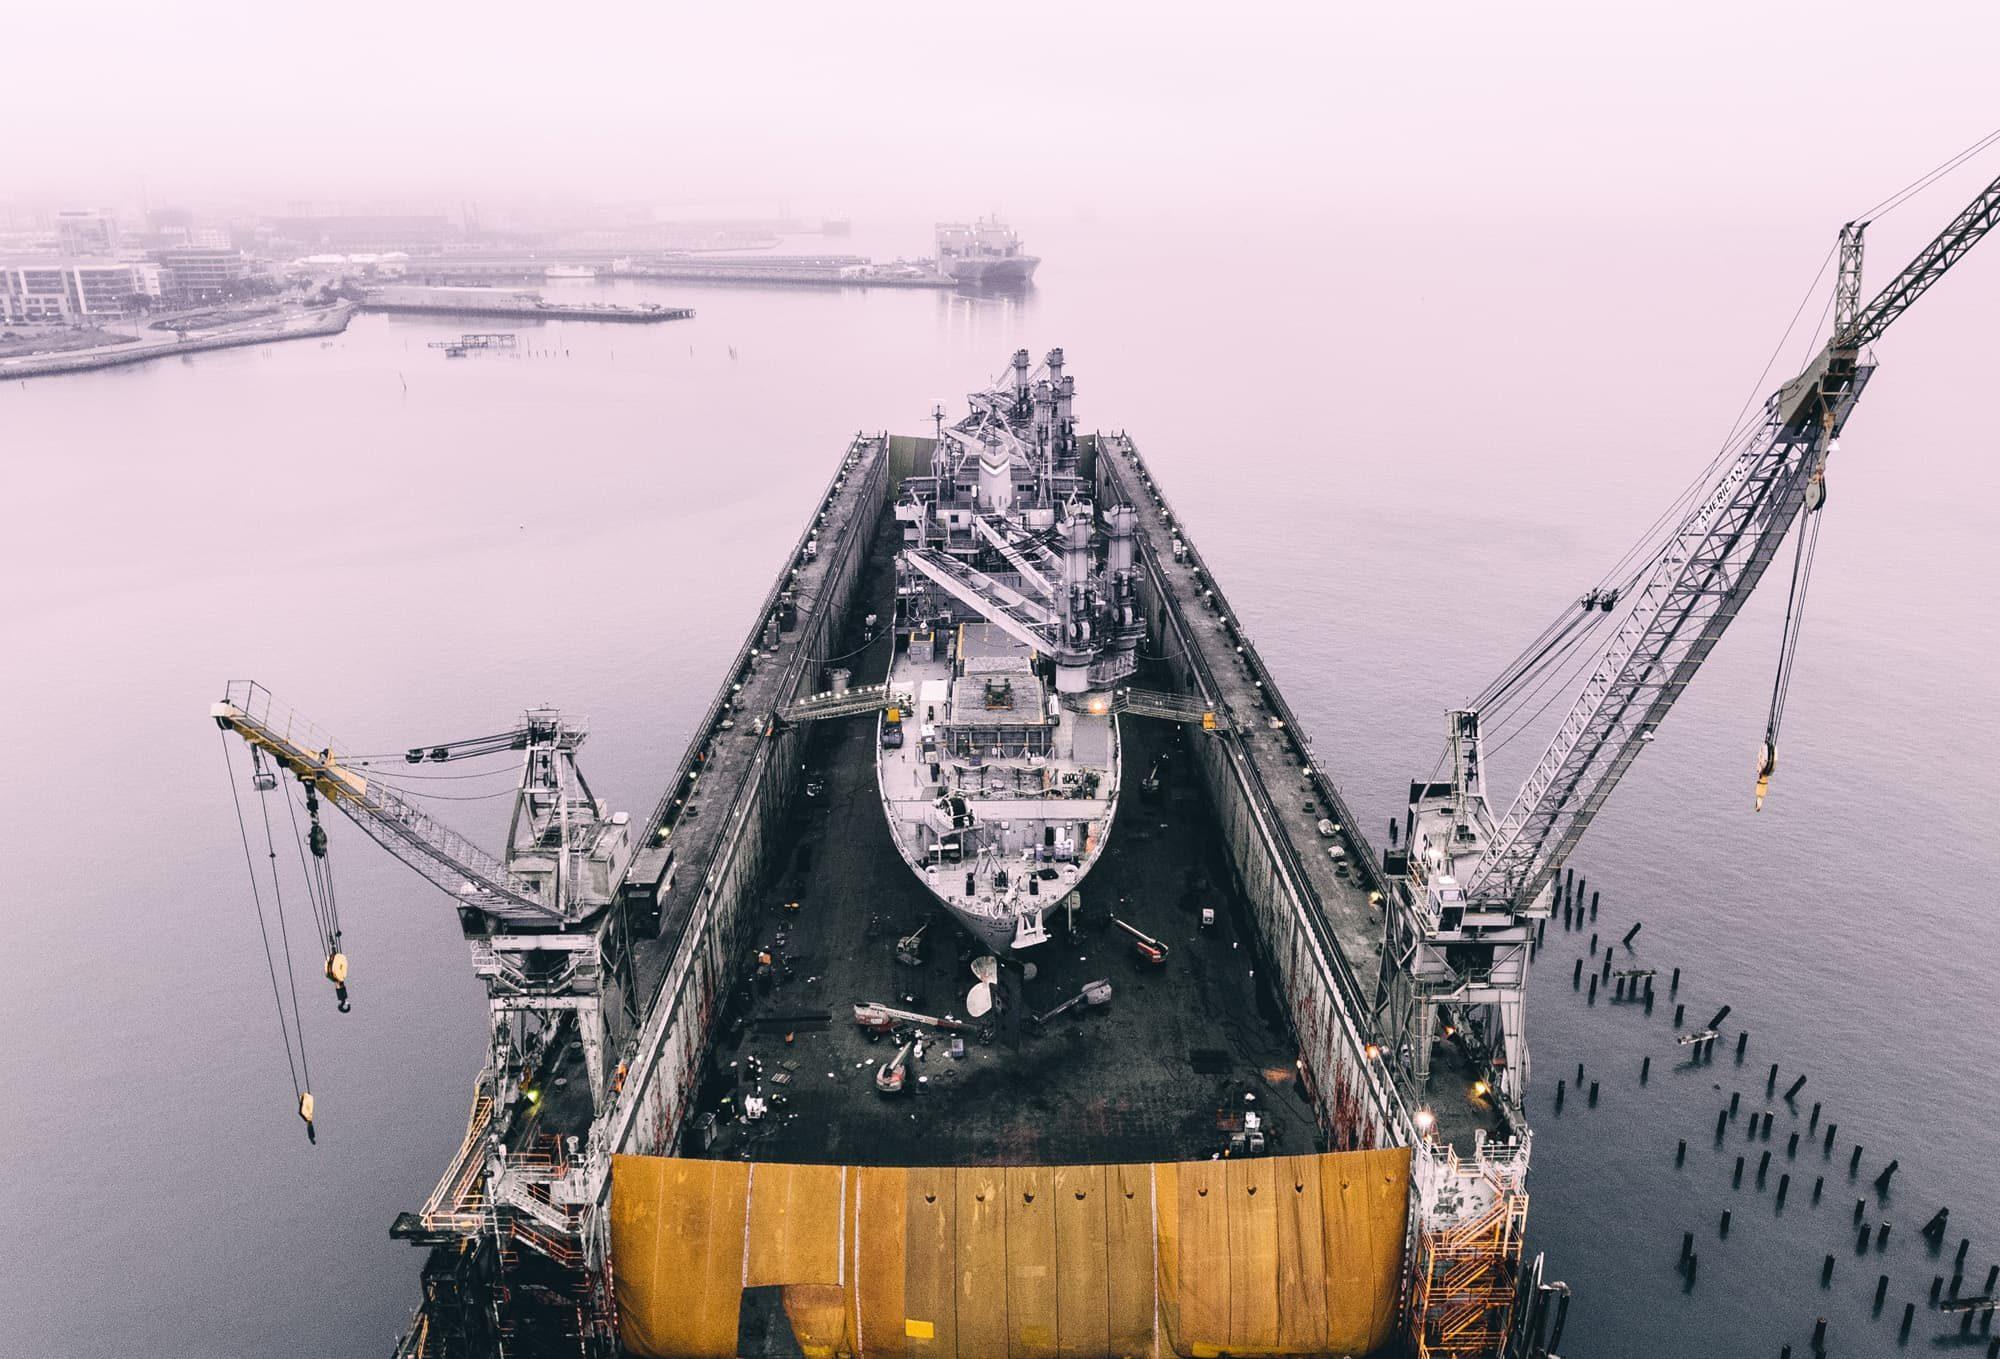 Travaux maritimes